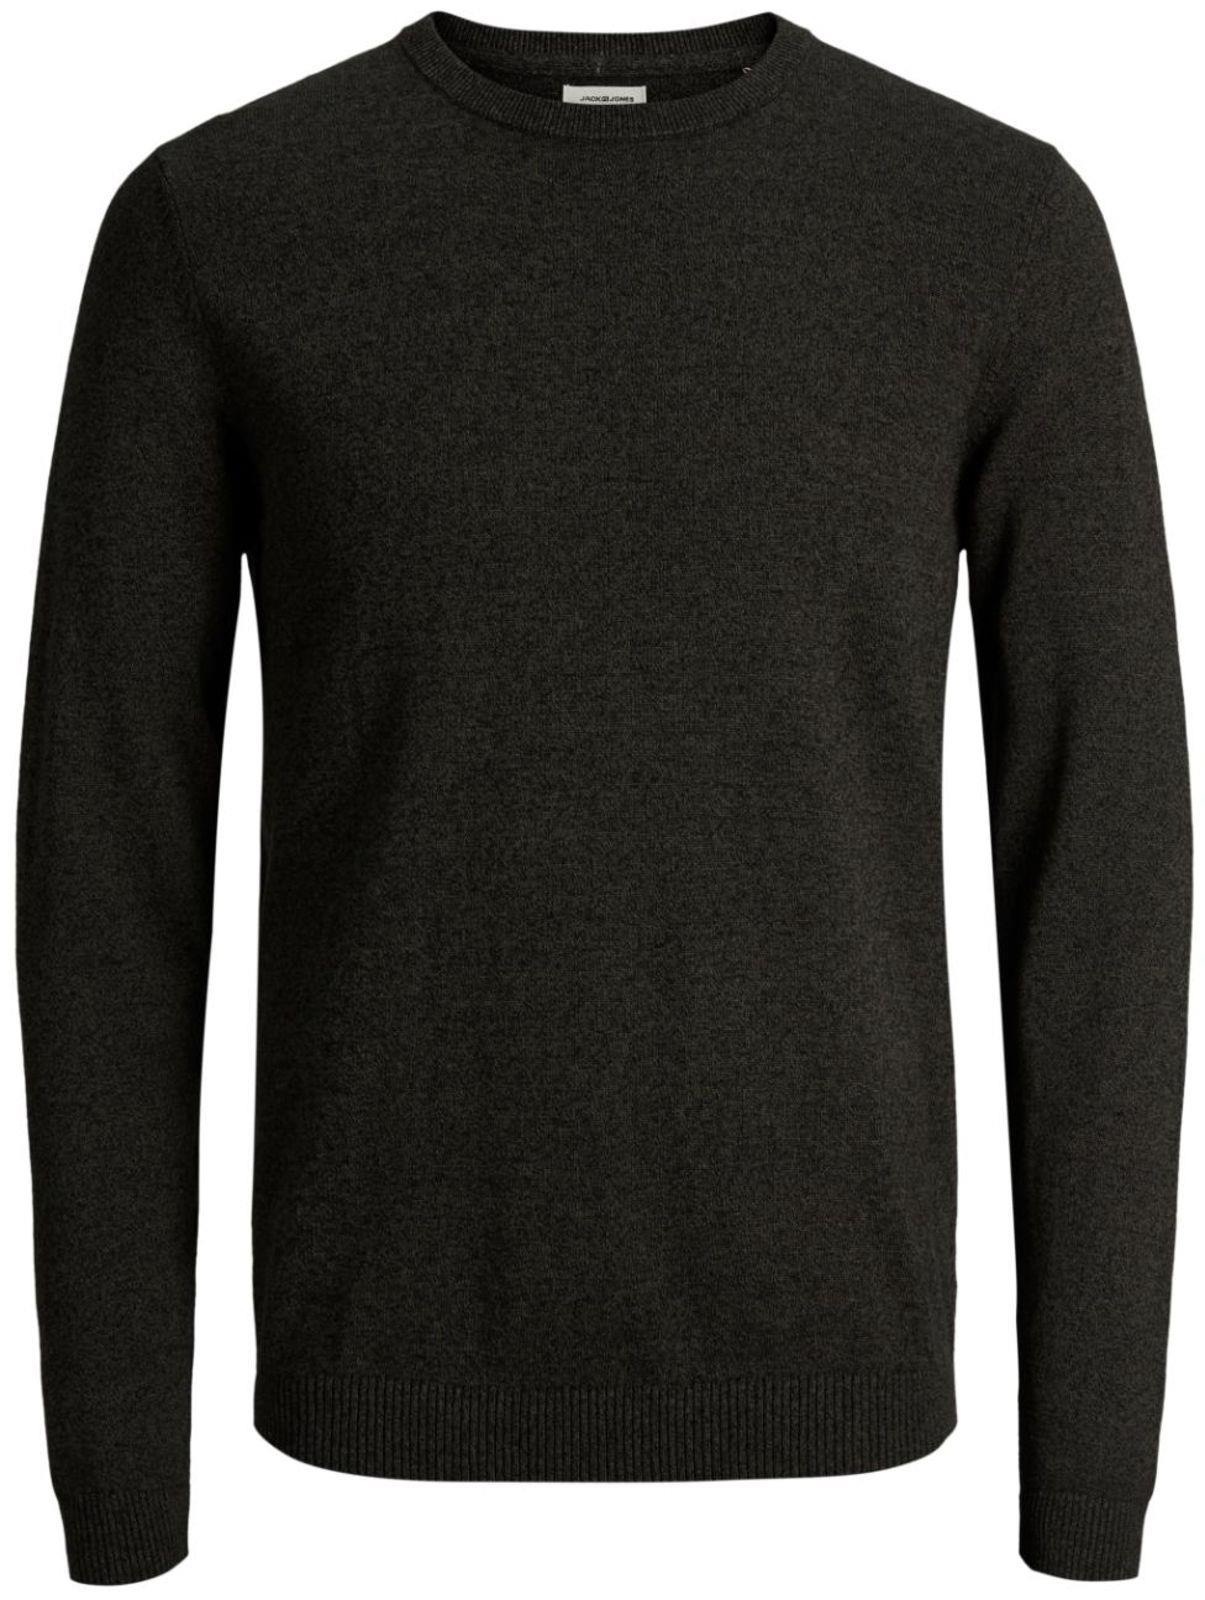 Jack-amp-Jones-Jumpers-Sweaters-Cardigans-Assorted-S-XXL miniatuur 4